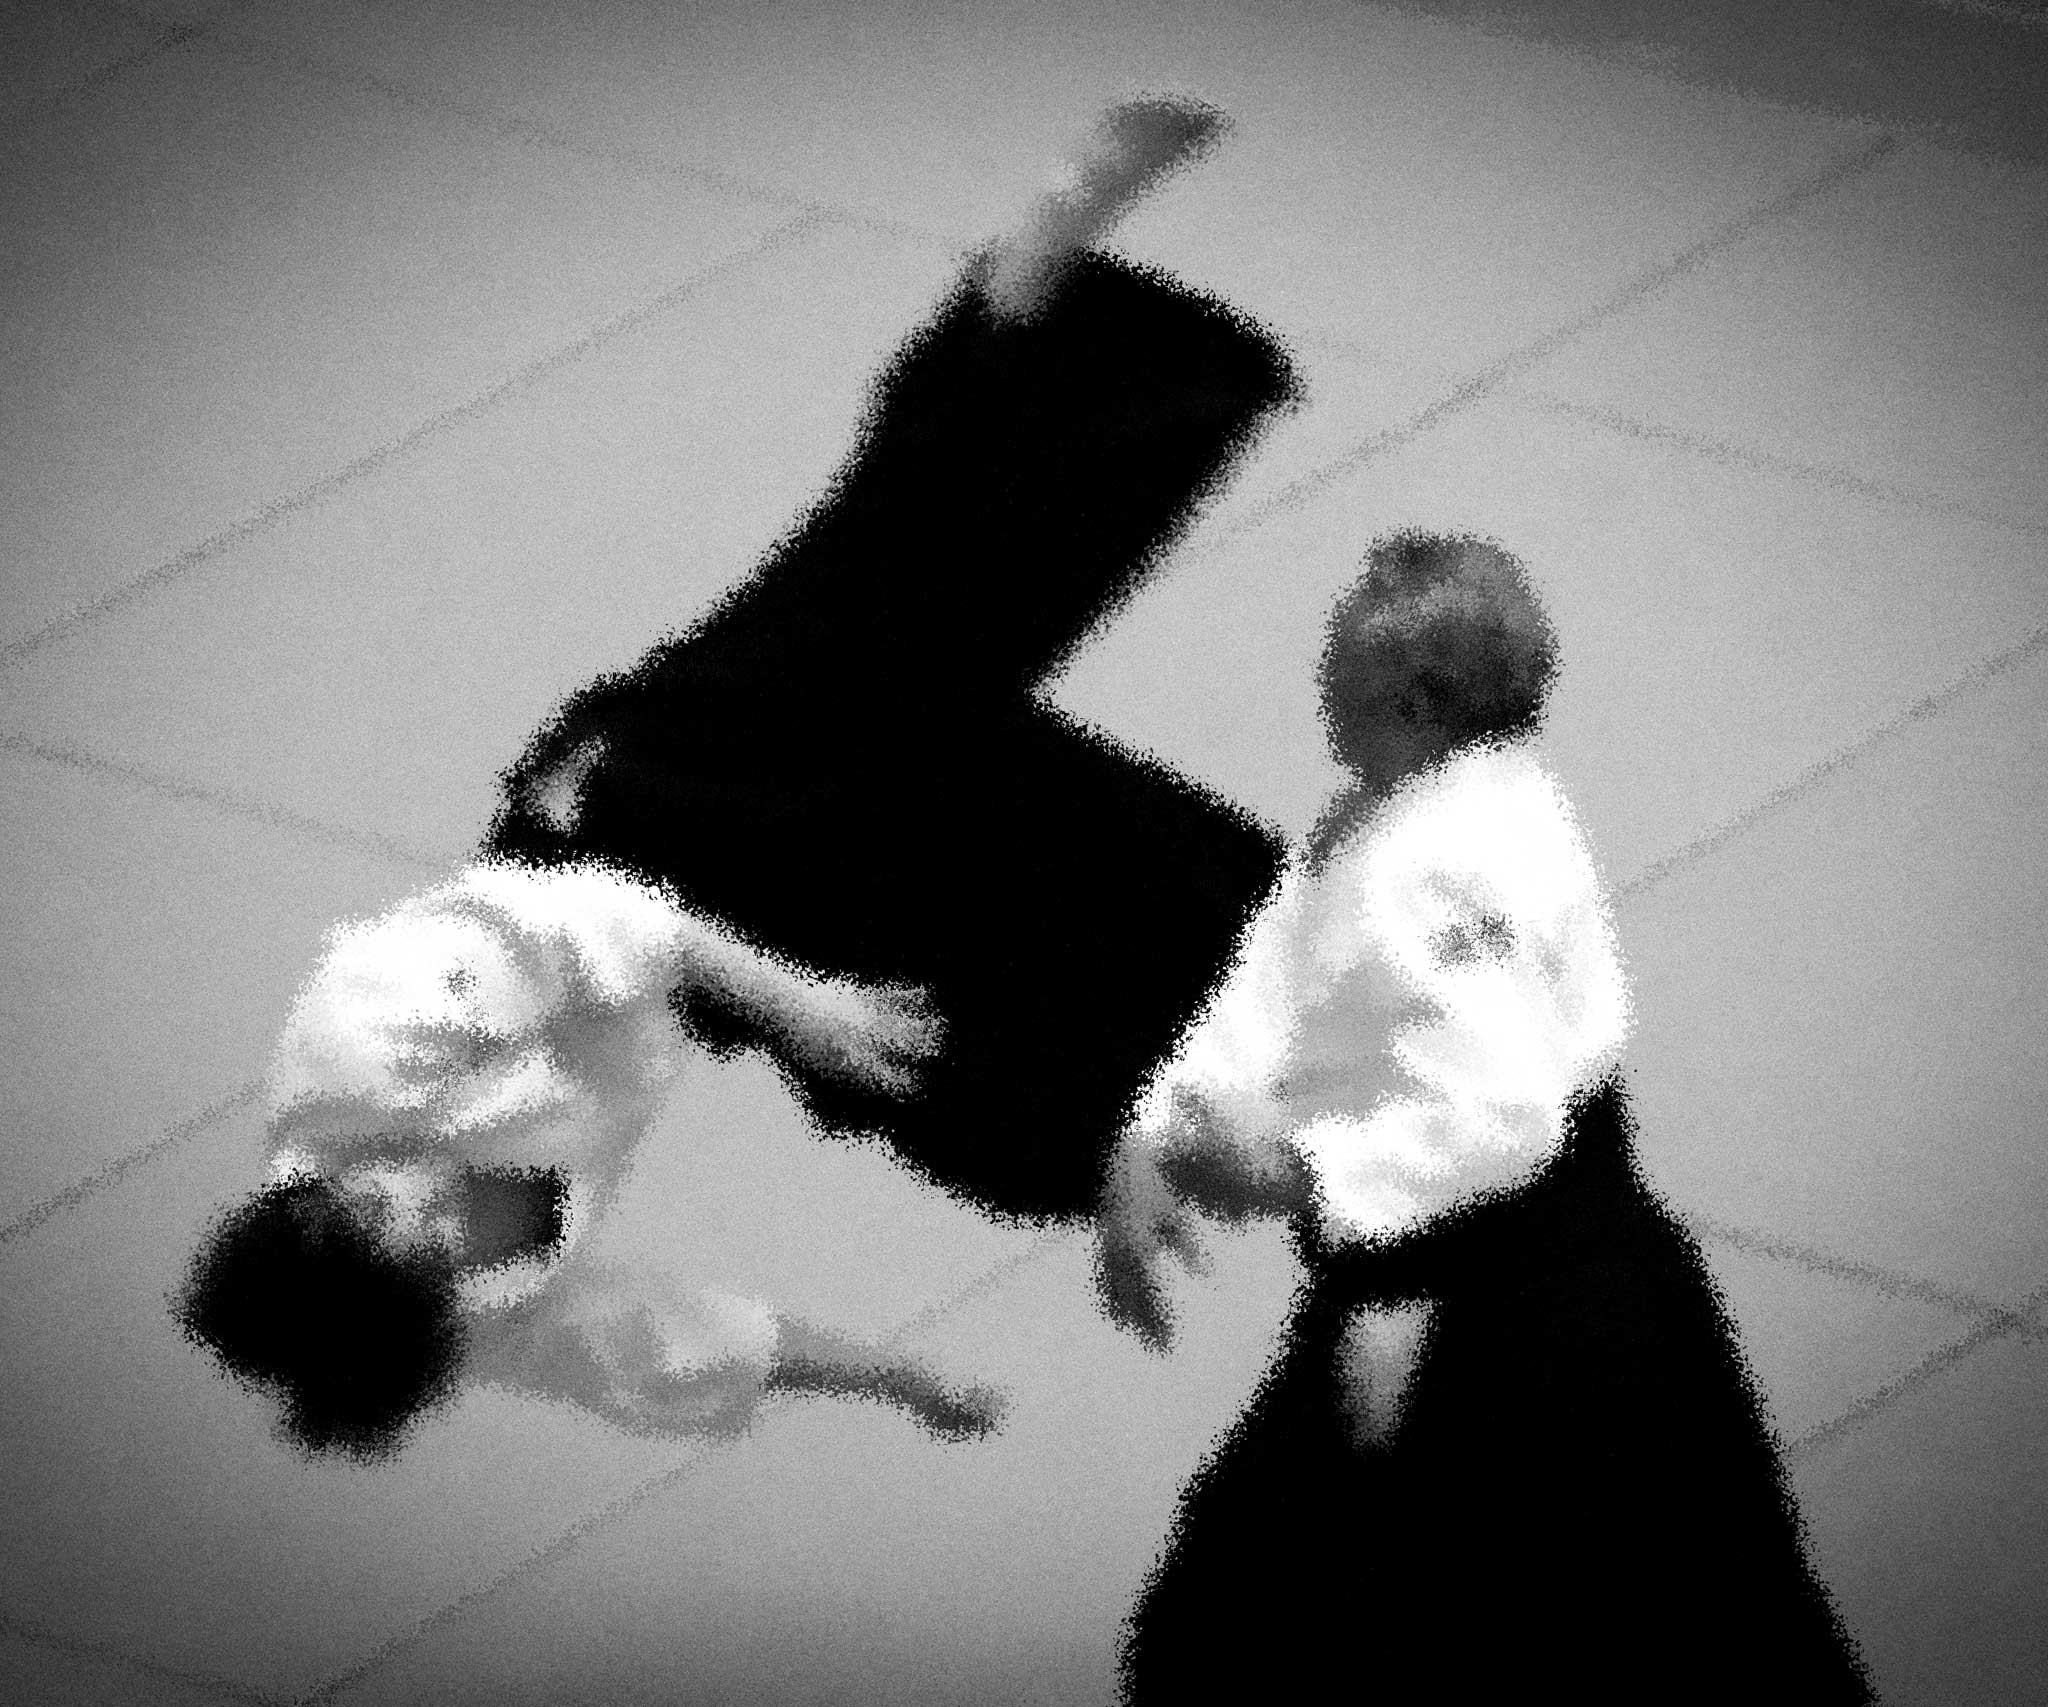 Watahiki-Sensei, 7th Dan, du Dōjō de la branche d'Ibaraki à la 51ᵉ Japan Aikido Demonstration